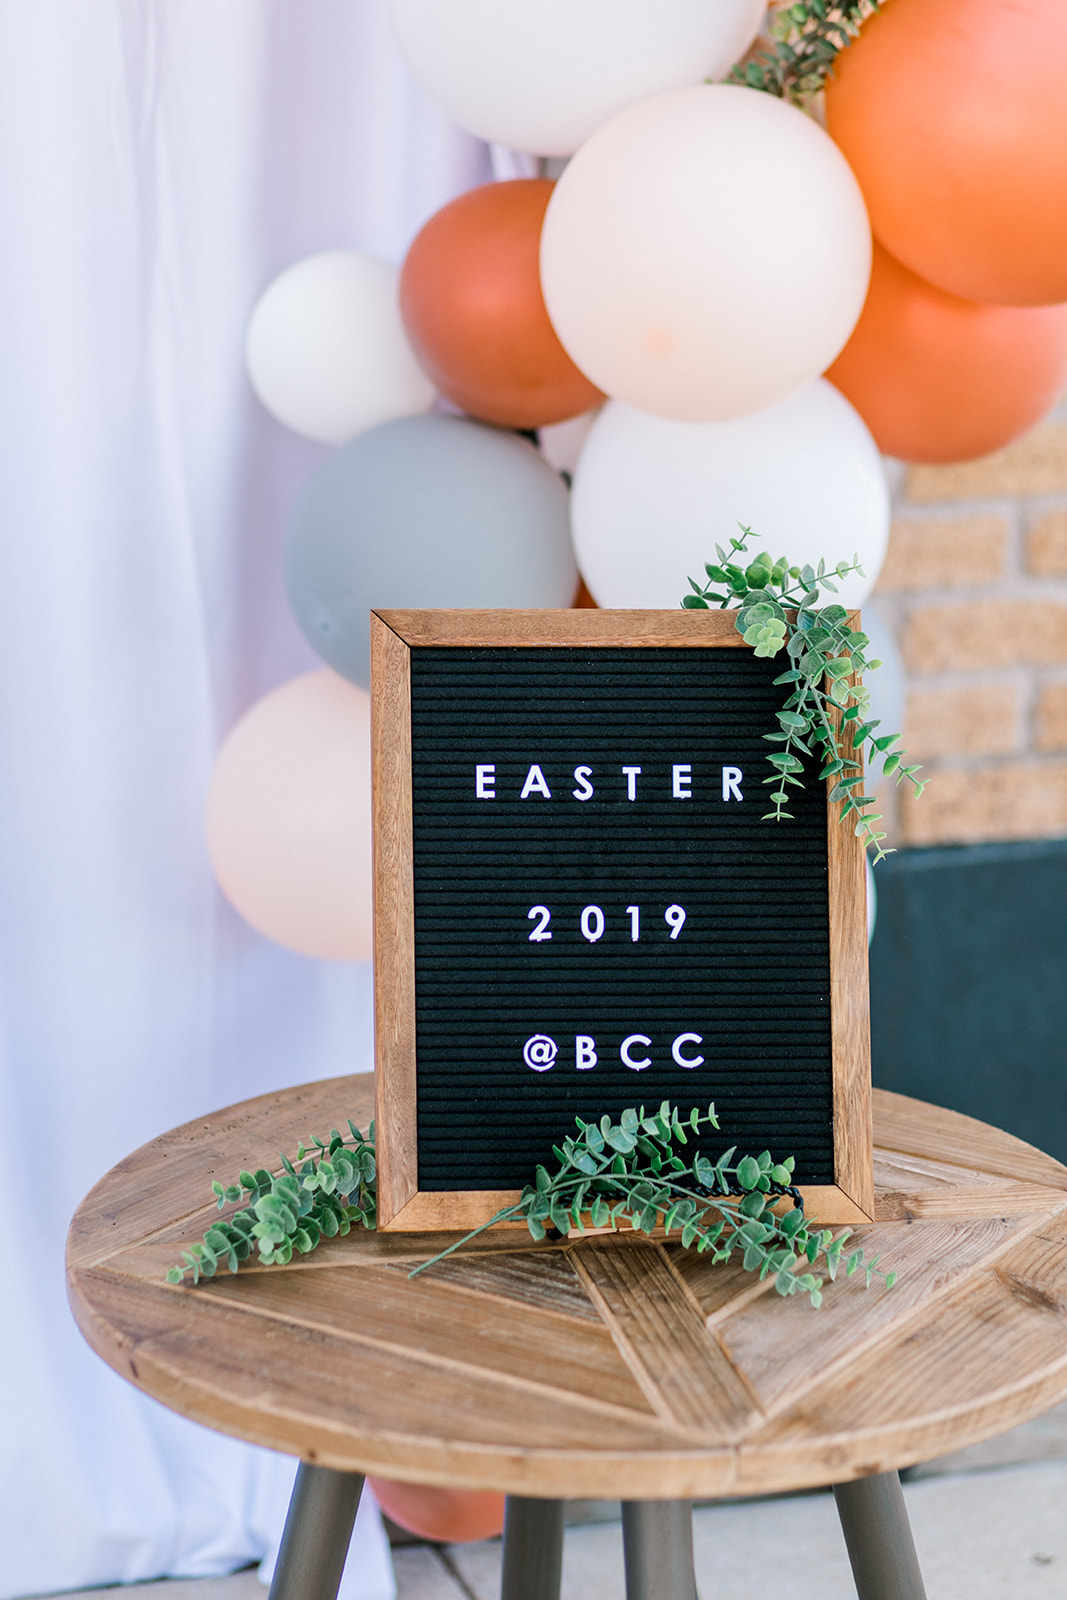 BCC Easter-241A3166.jpg